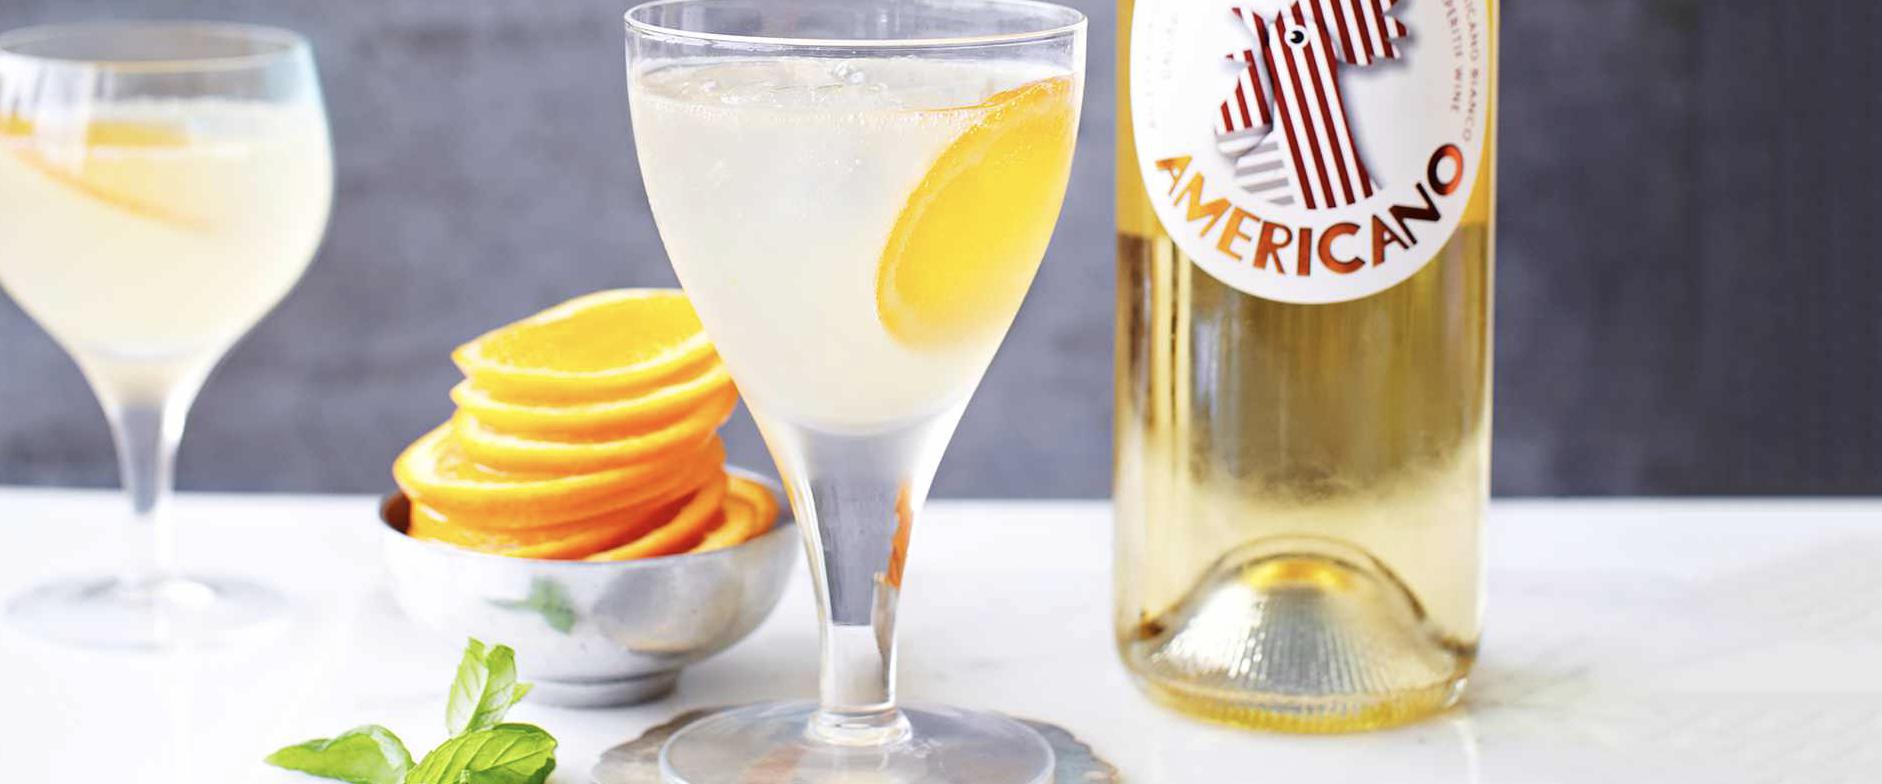 The new spritz - Cocchi Americano spritz with grapefruit juice and prosecco